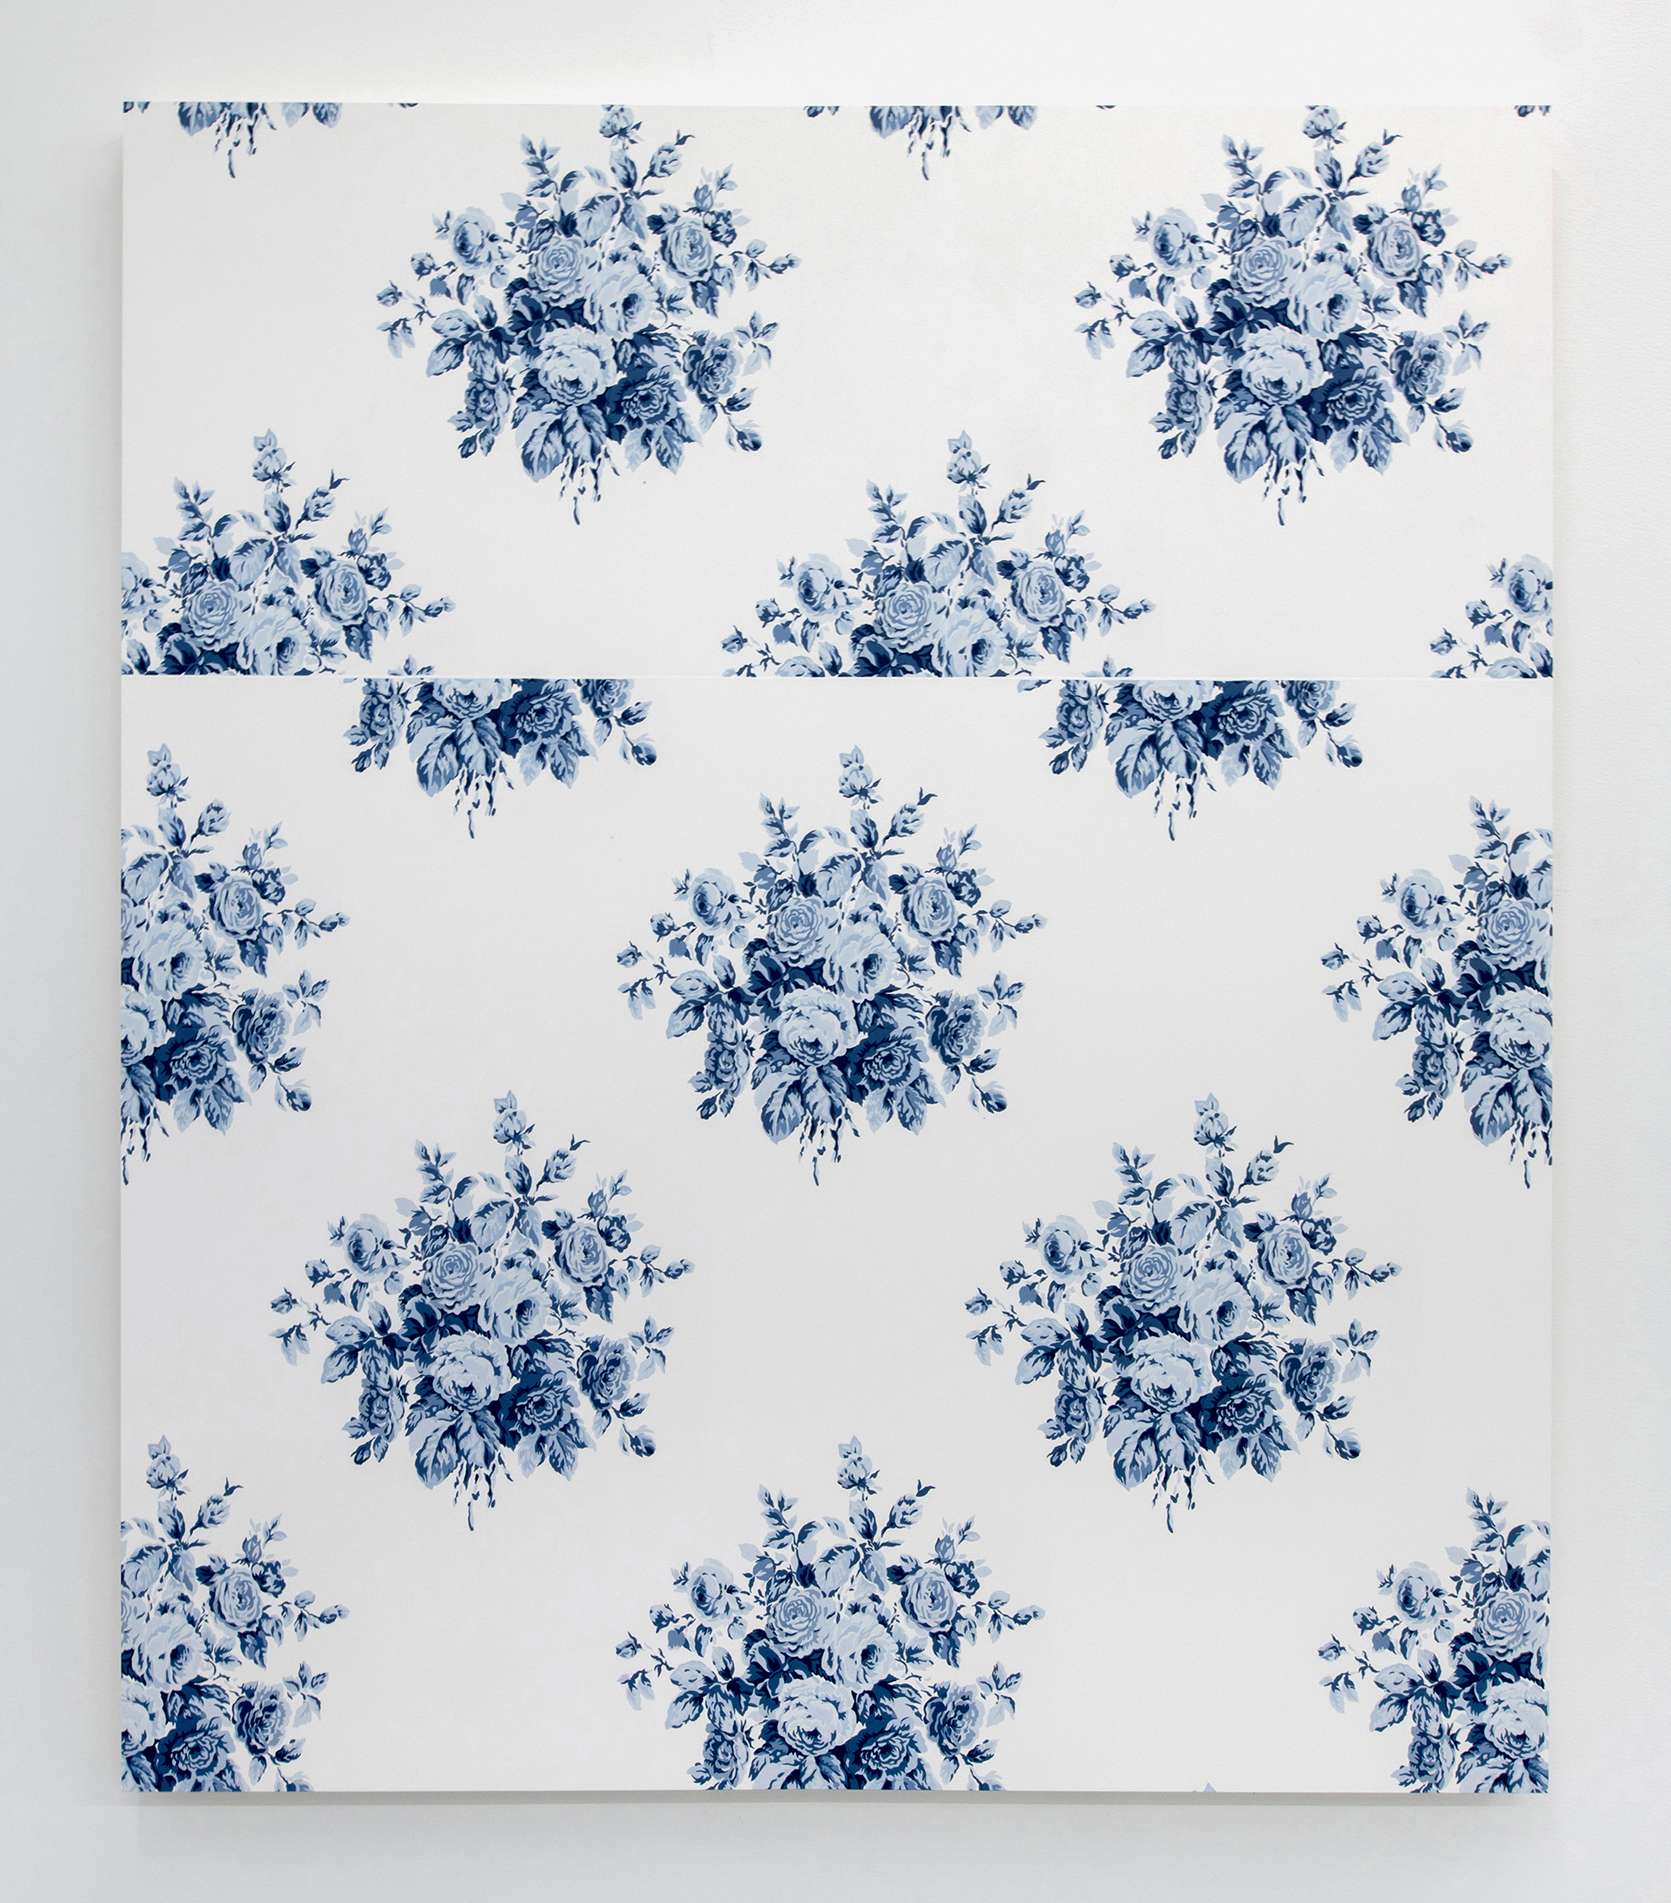 Wainscott_Floral_Porcelain.jpg